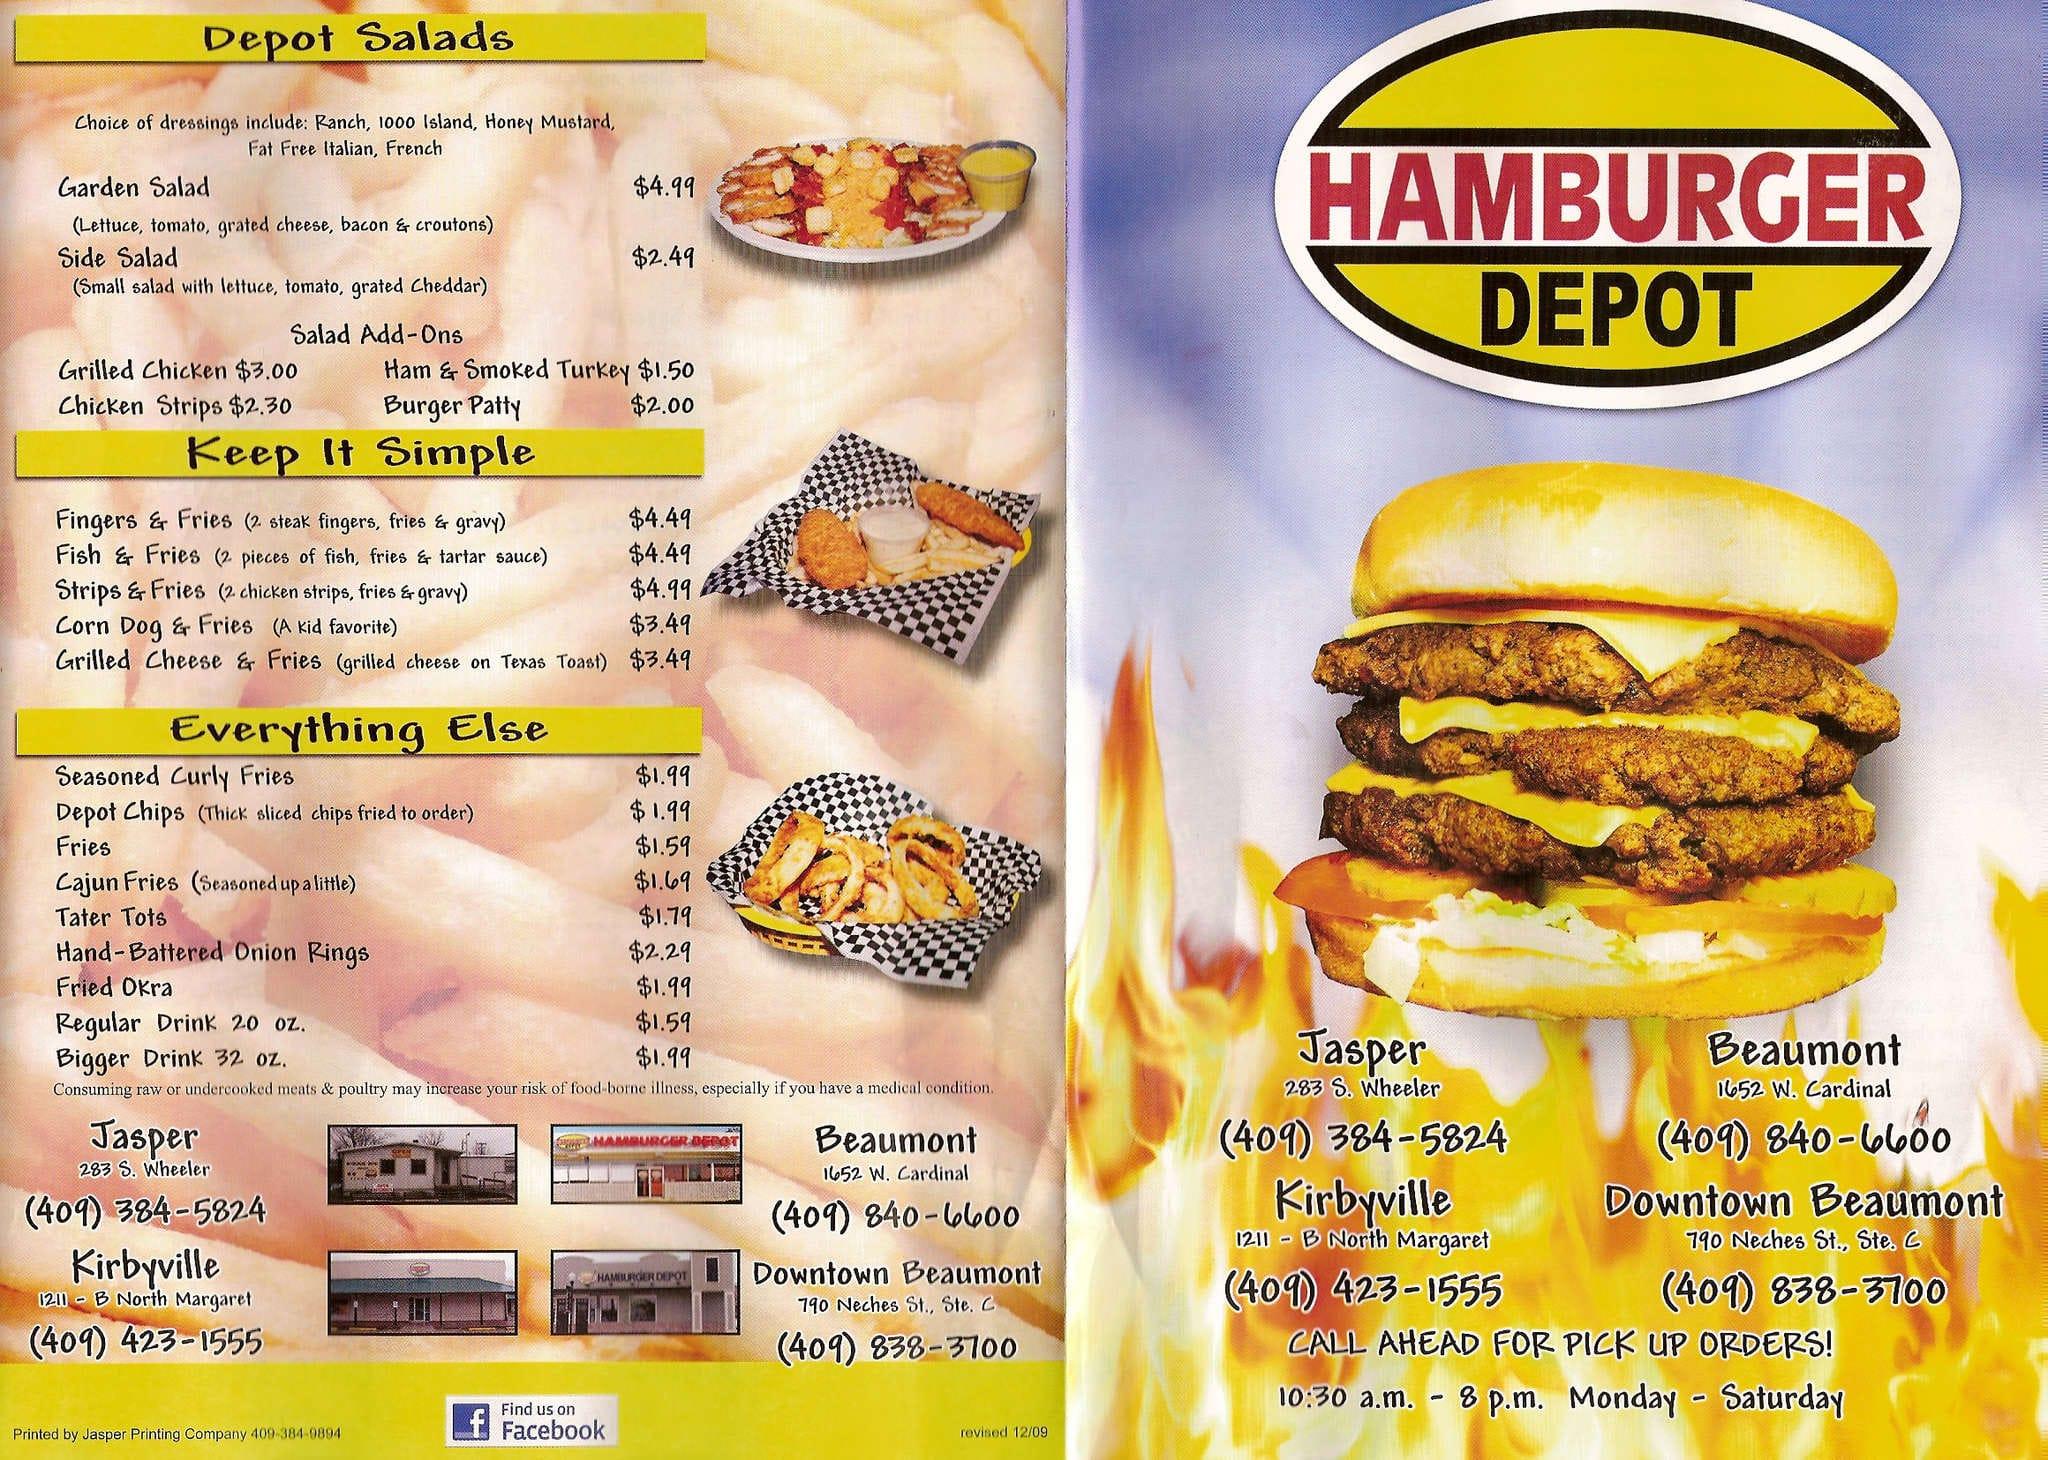 Food Depot Lunch Menu